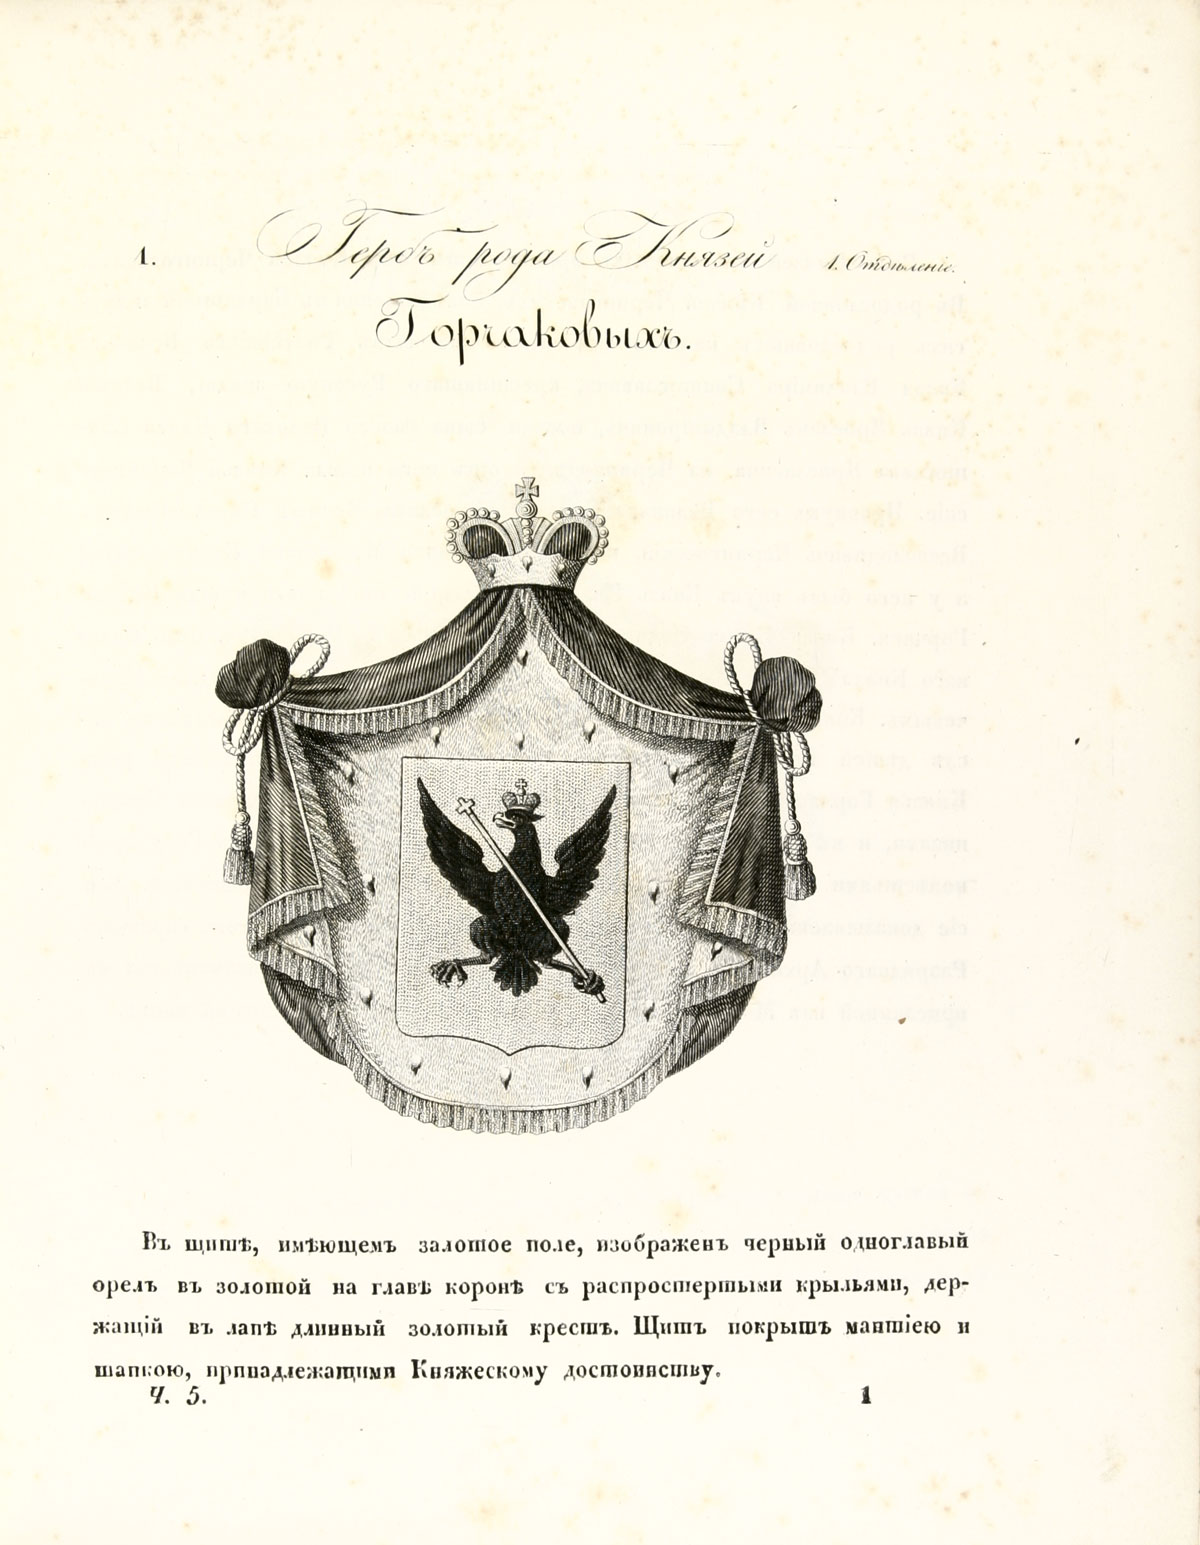 Герб рода князей Горчаковых, стр. 1